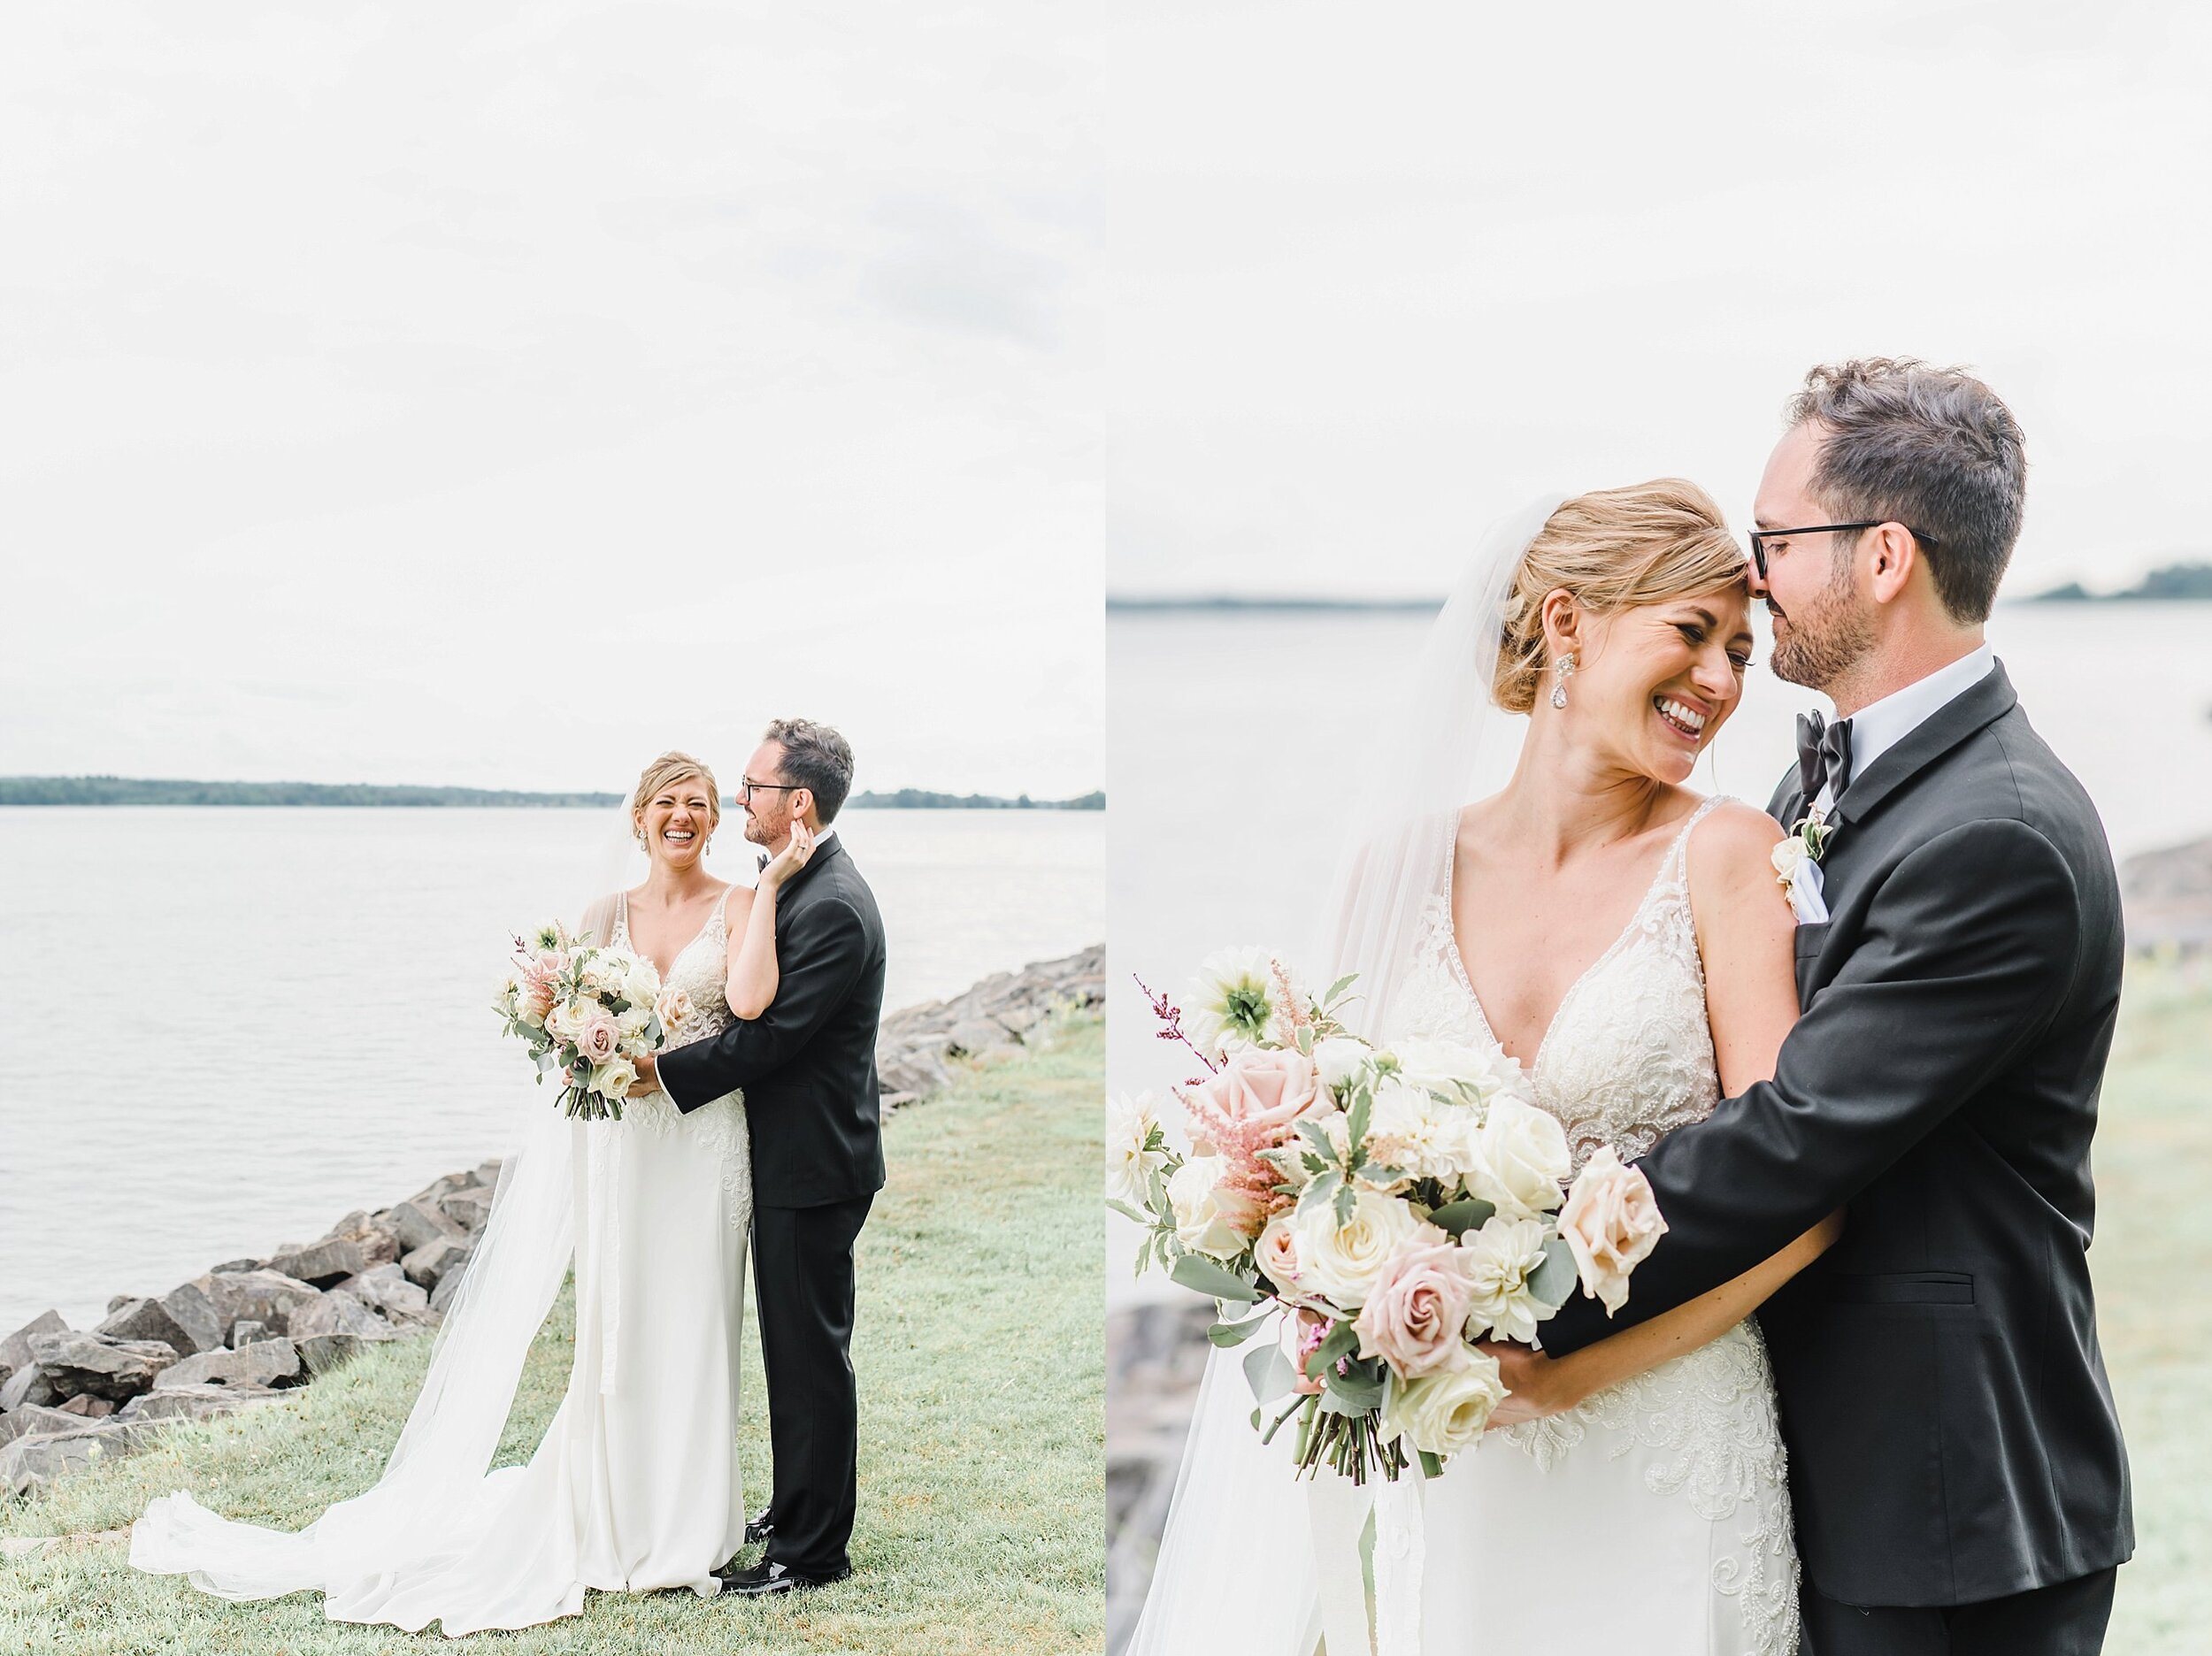 light airy fine art ottawa wedding photographer | Ali and Batoul Photography | Fairmont Le Chateau Montebello59.jpg